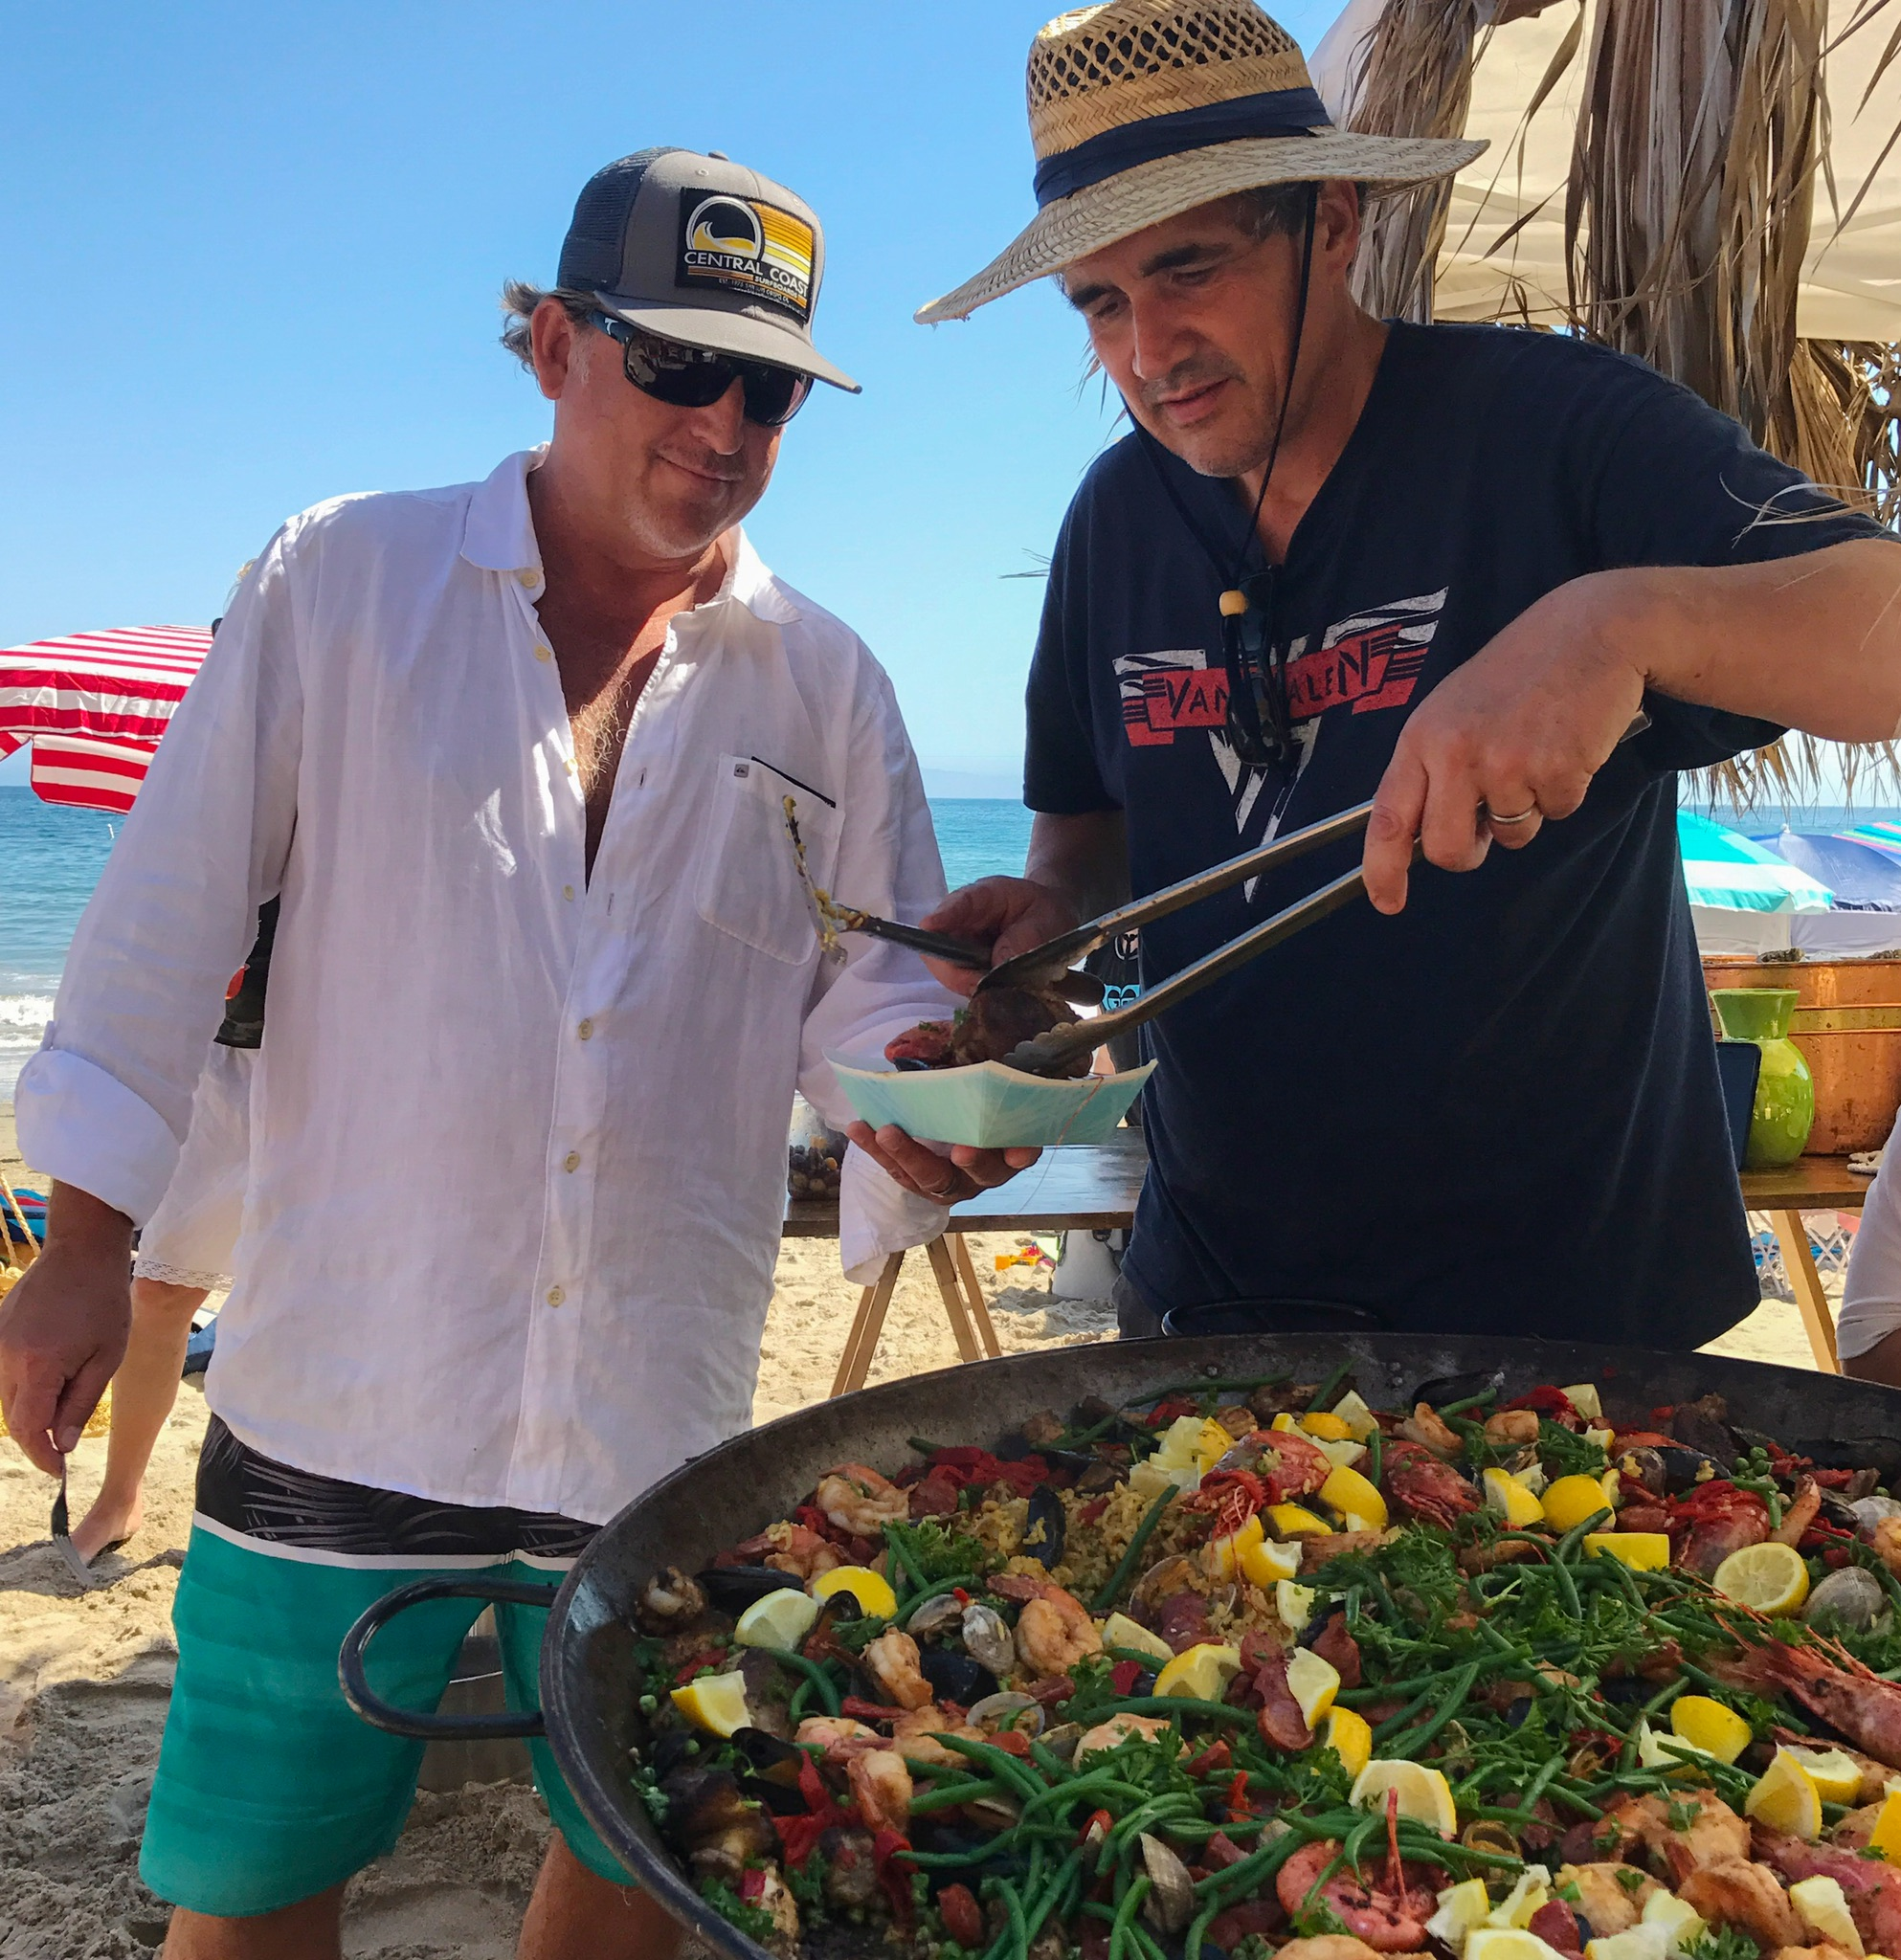 bomba-paella-catering-butterfly-beach6.jpg